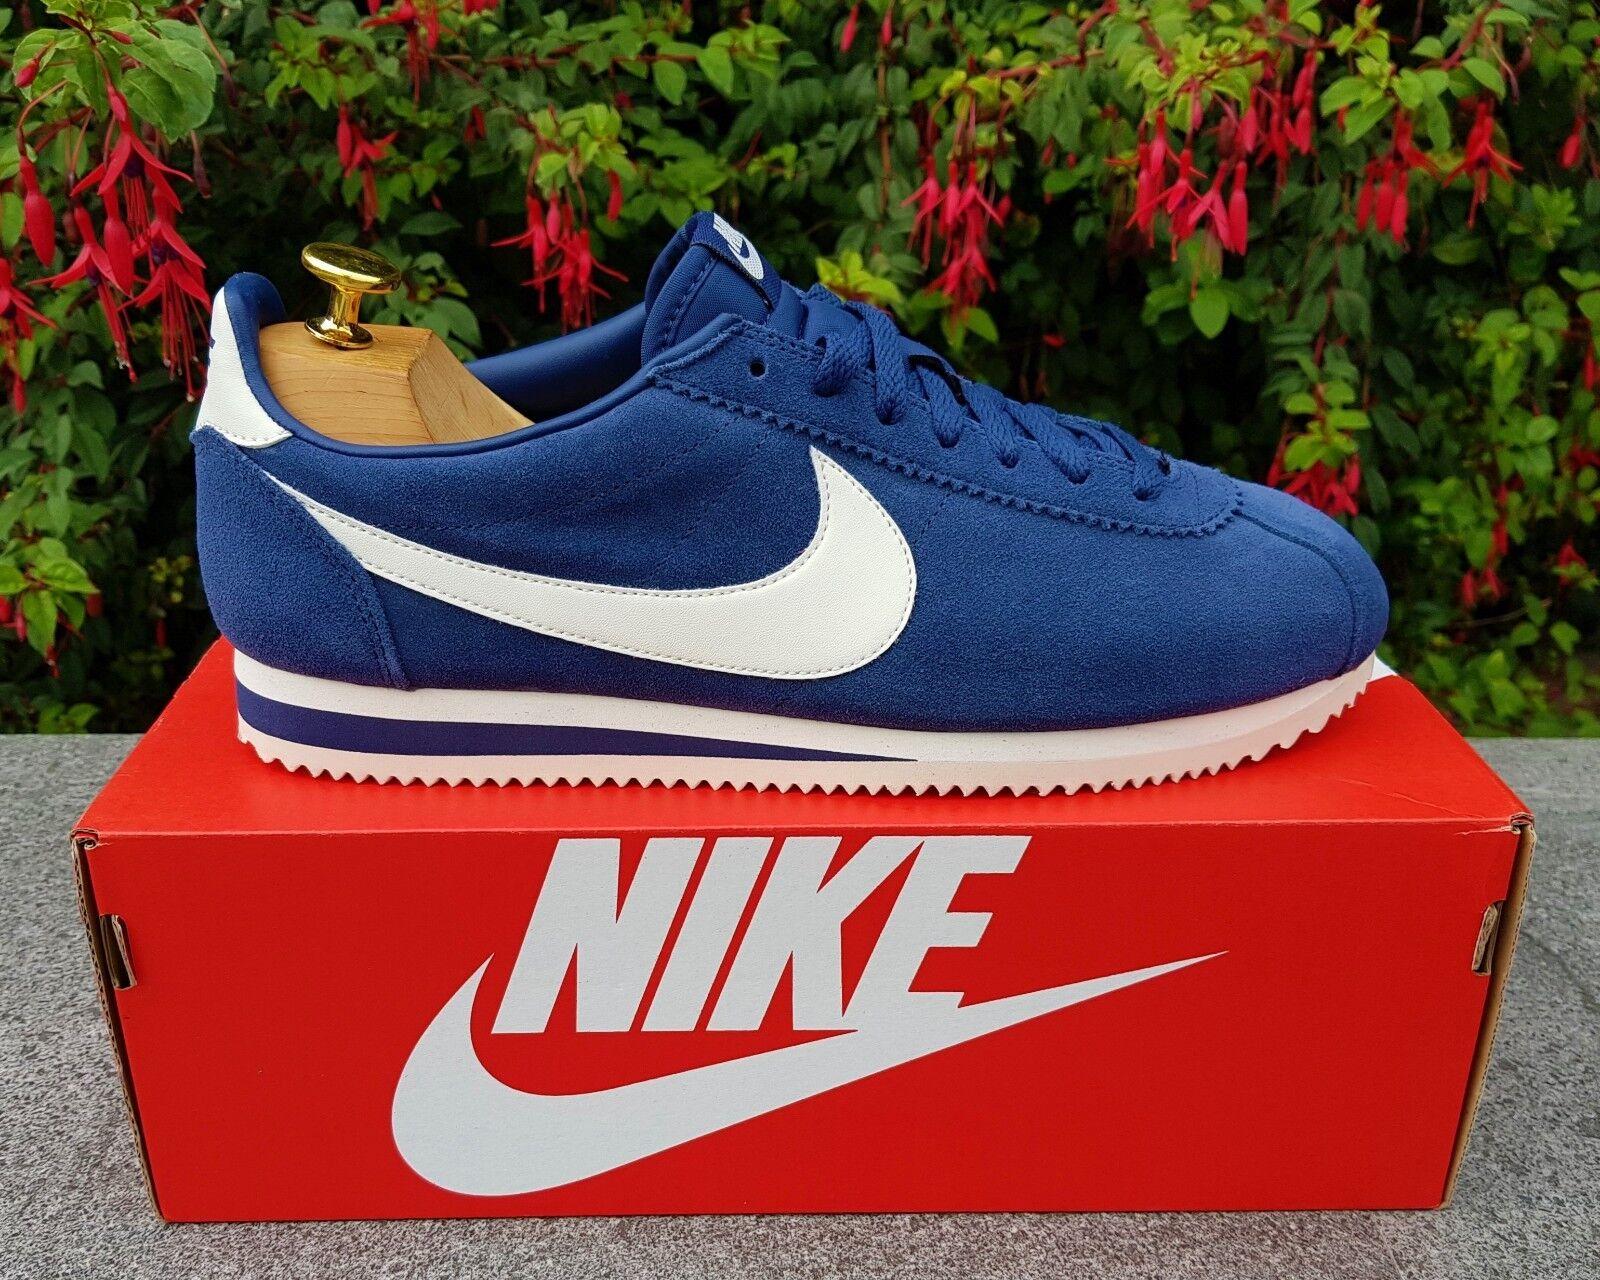 BNWB & Authentic Nike ® Classic Cortez SE Suede Navy & Sail Trainers UK